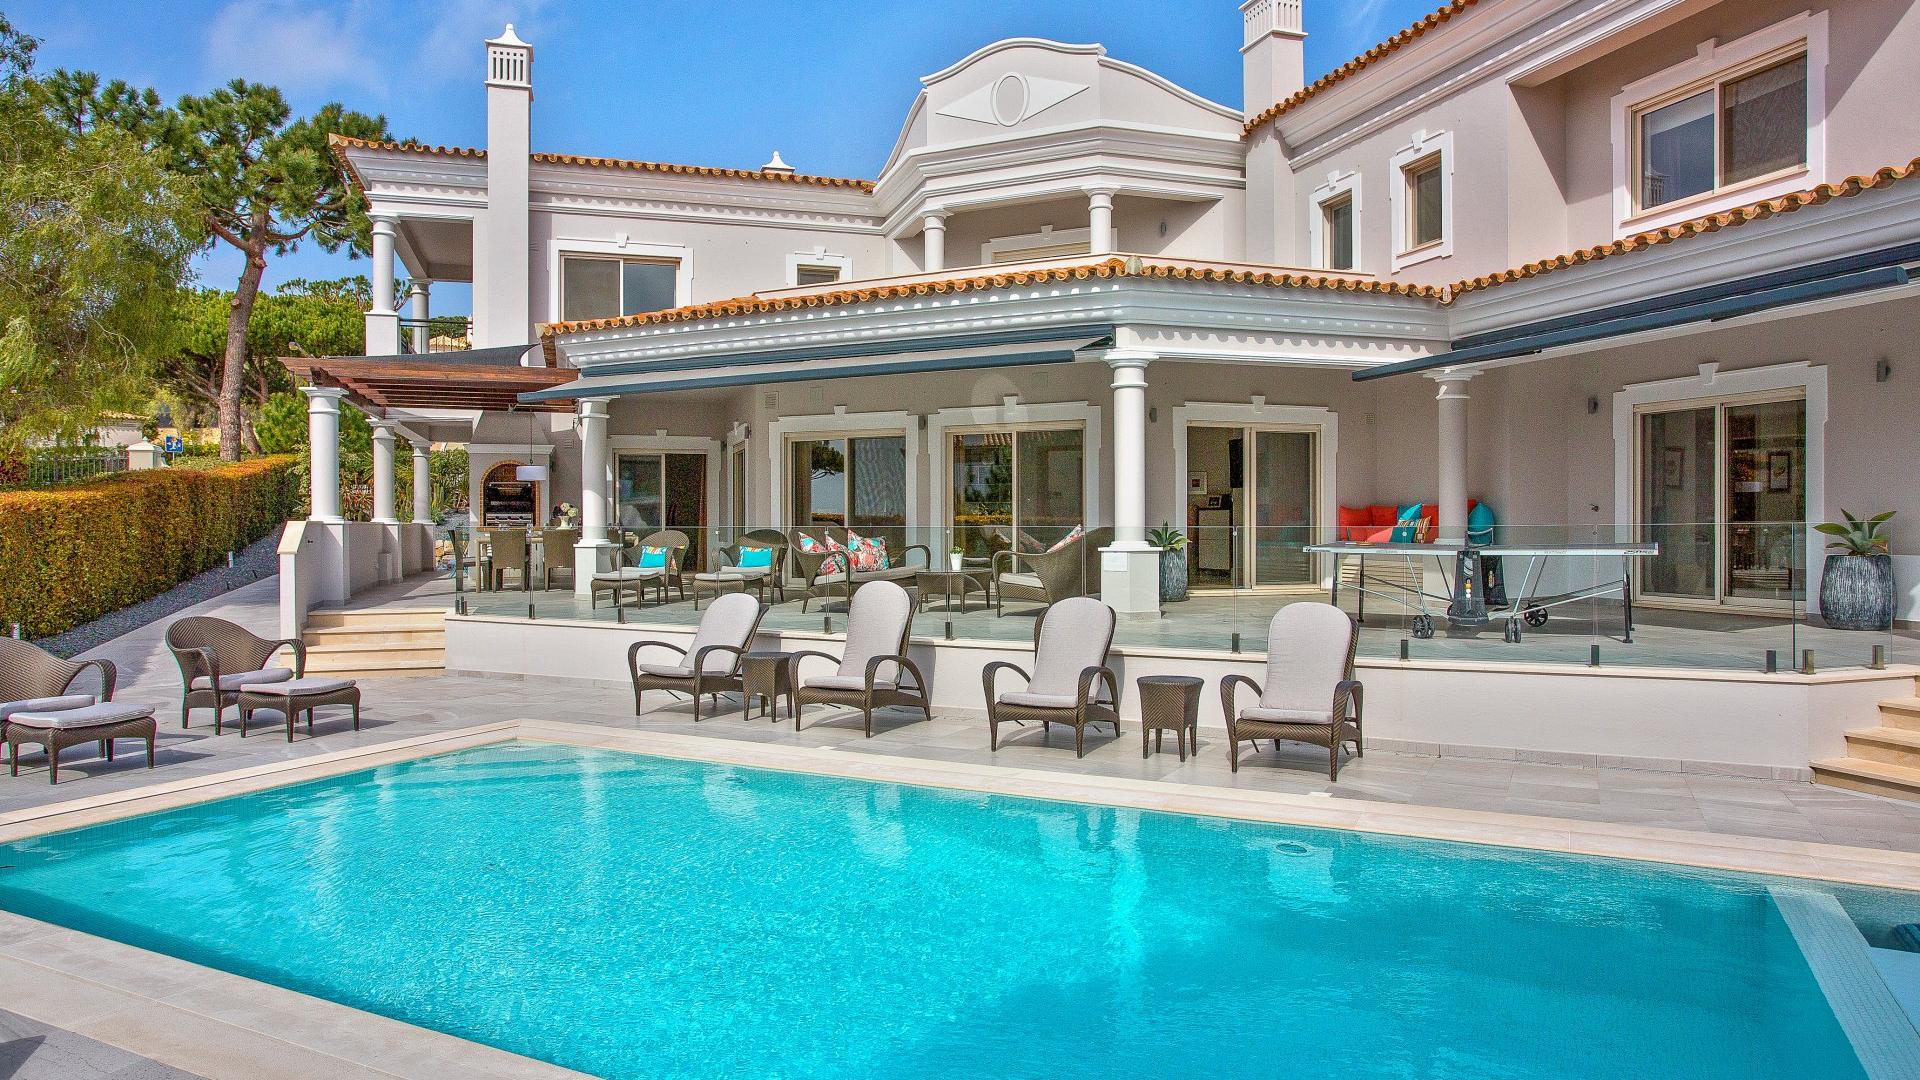 Villa Luna - Dunas Douradas, Vale do Lobo, Algarve - _P1_4615_1.jpg